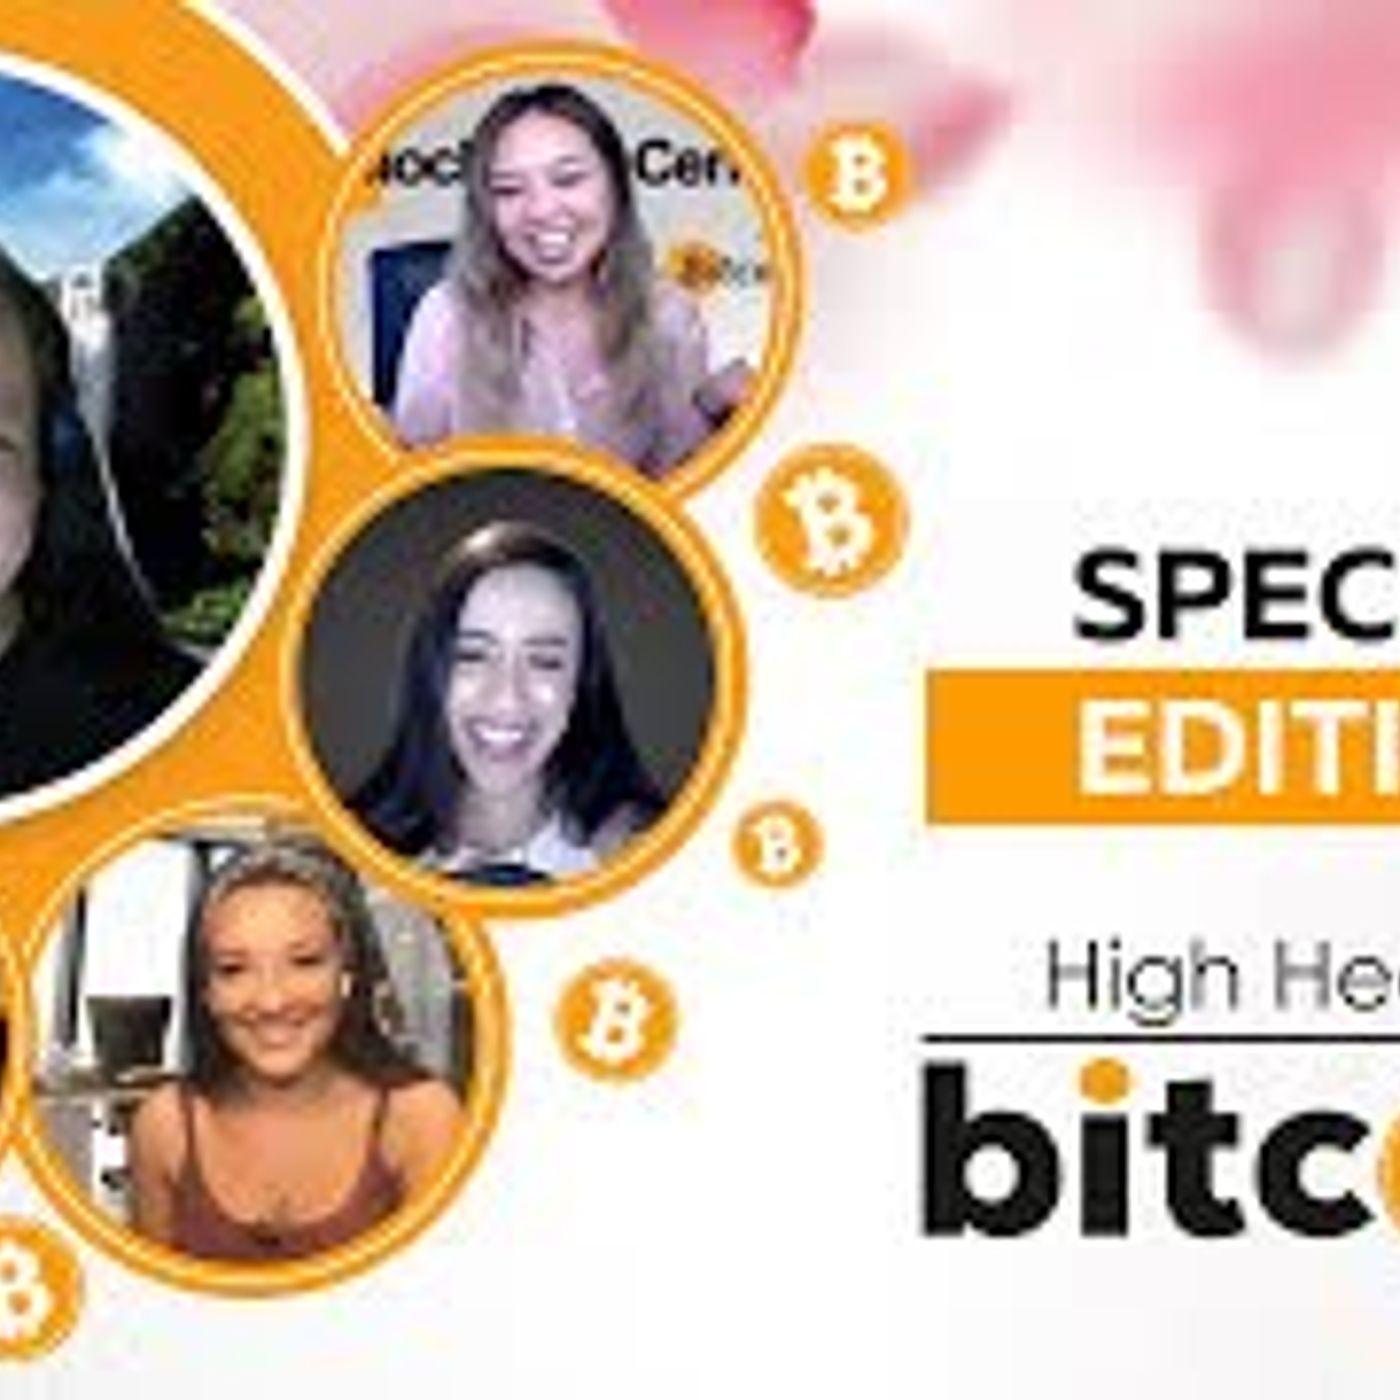 High Heels of Bitcoin Special #2 - Freedom | Litecoin Lisa, Layah Heilpern, Wendy O, Eryka Gemma